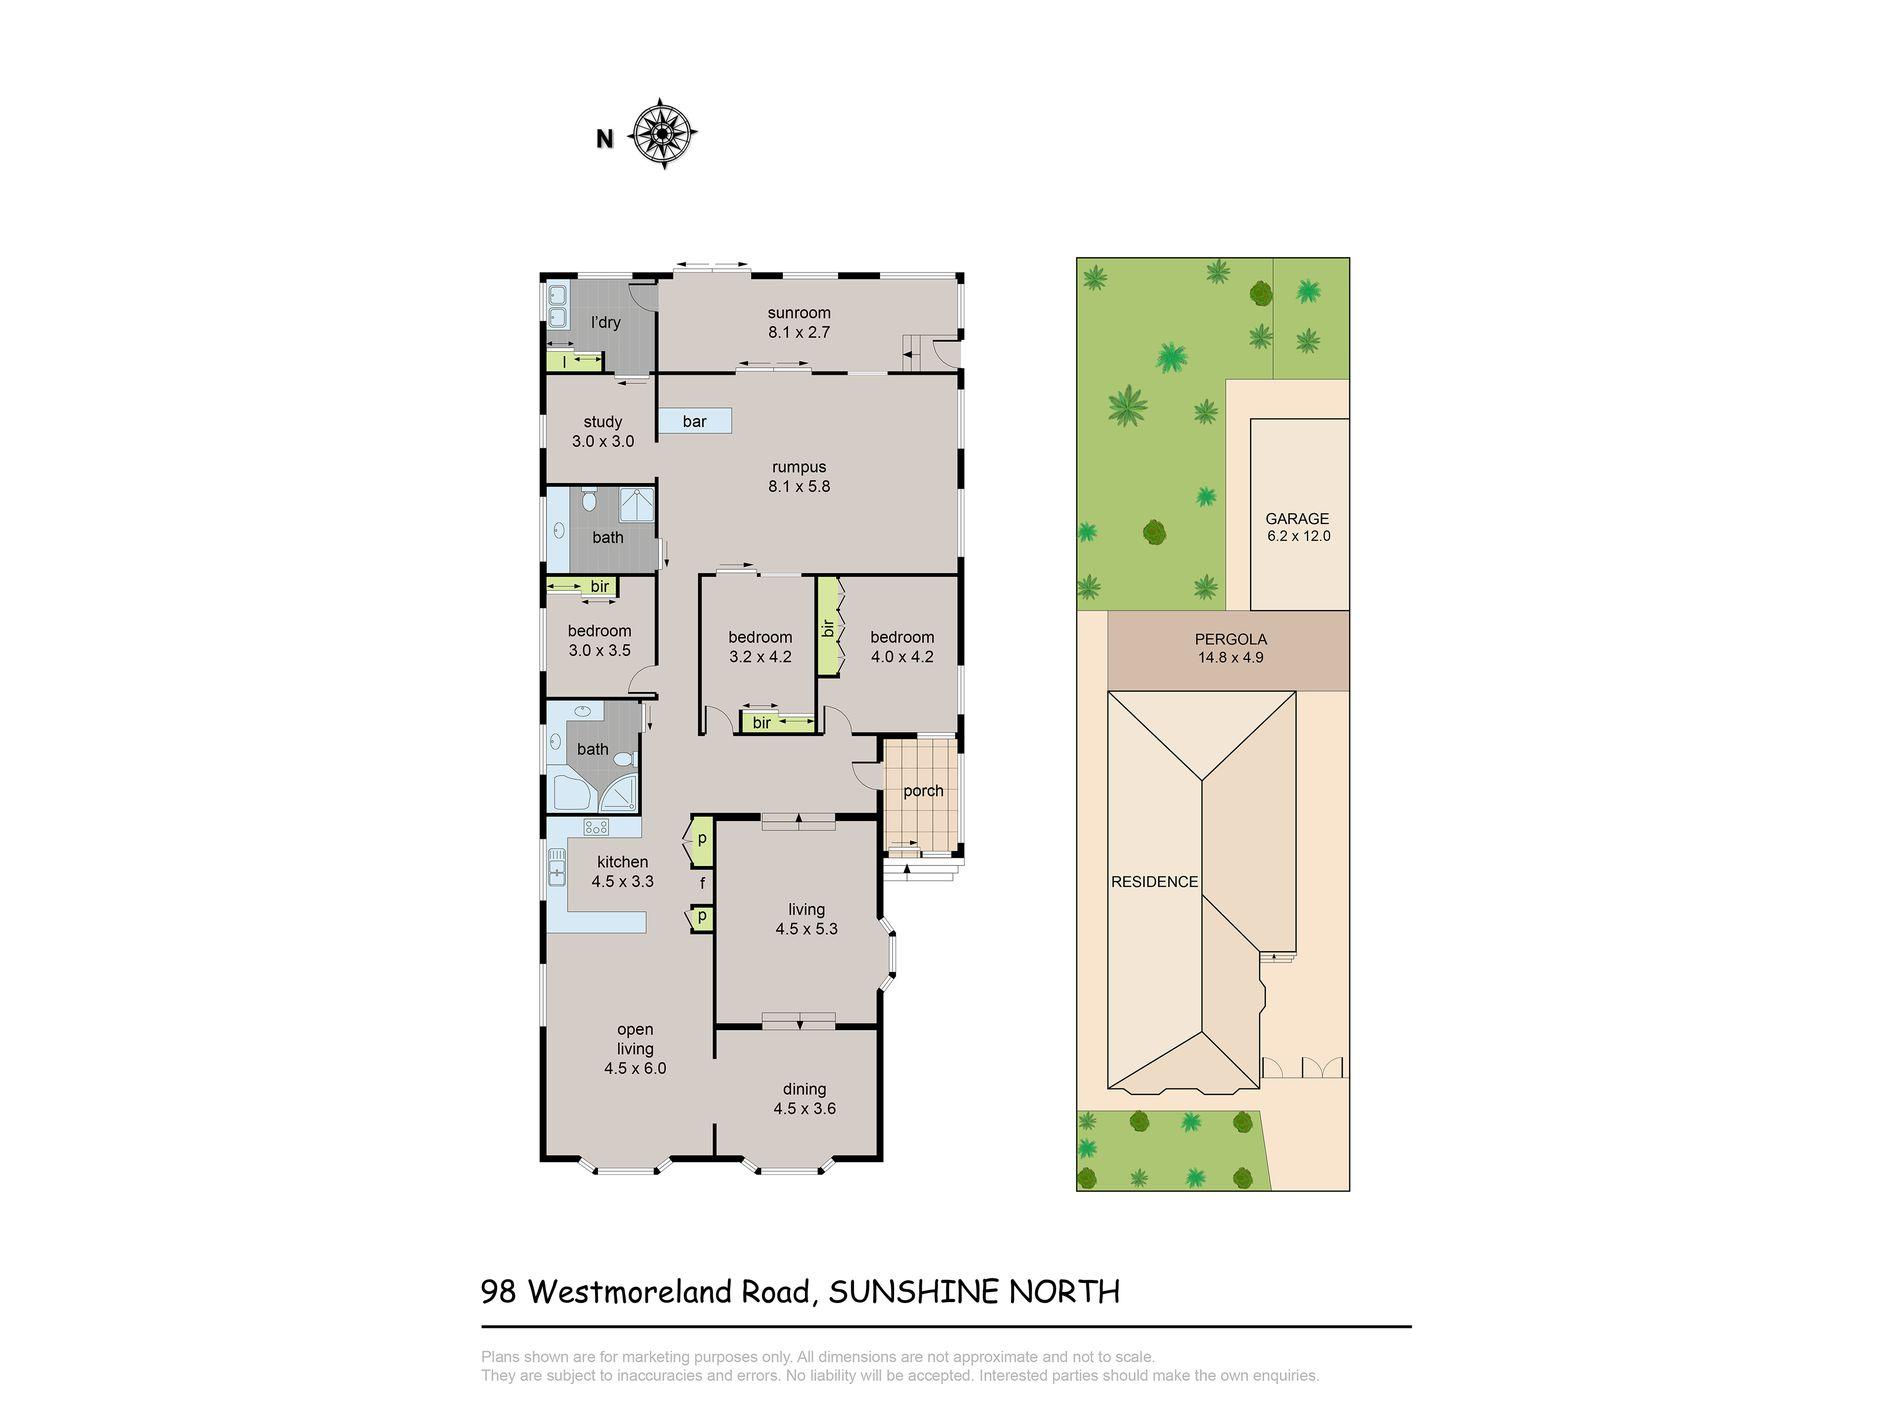 98 Westmoreland Road, Sunshine North